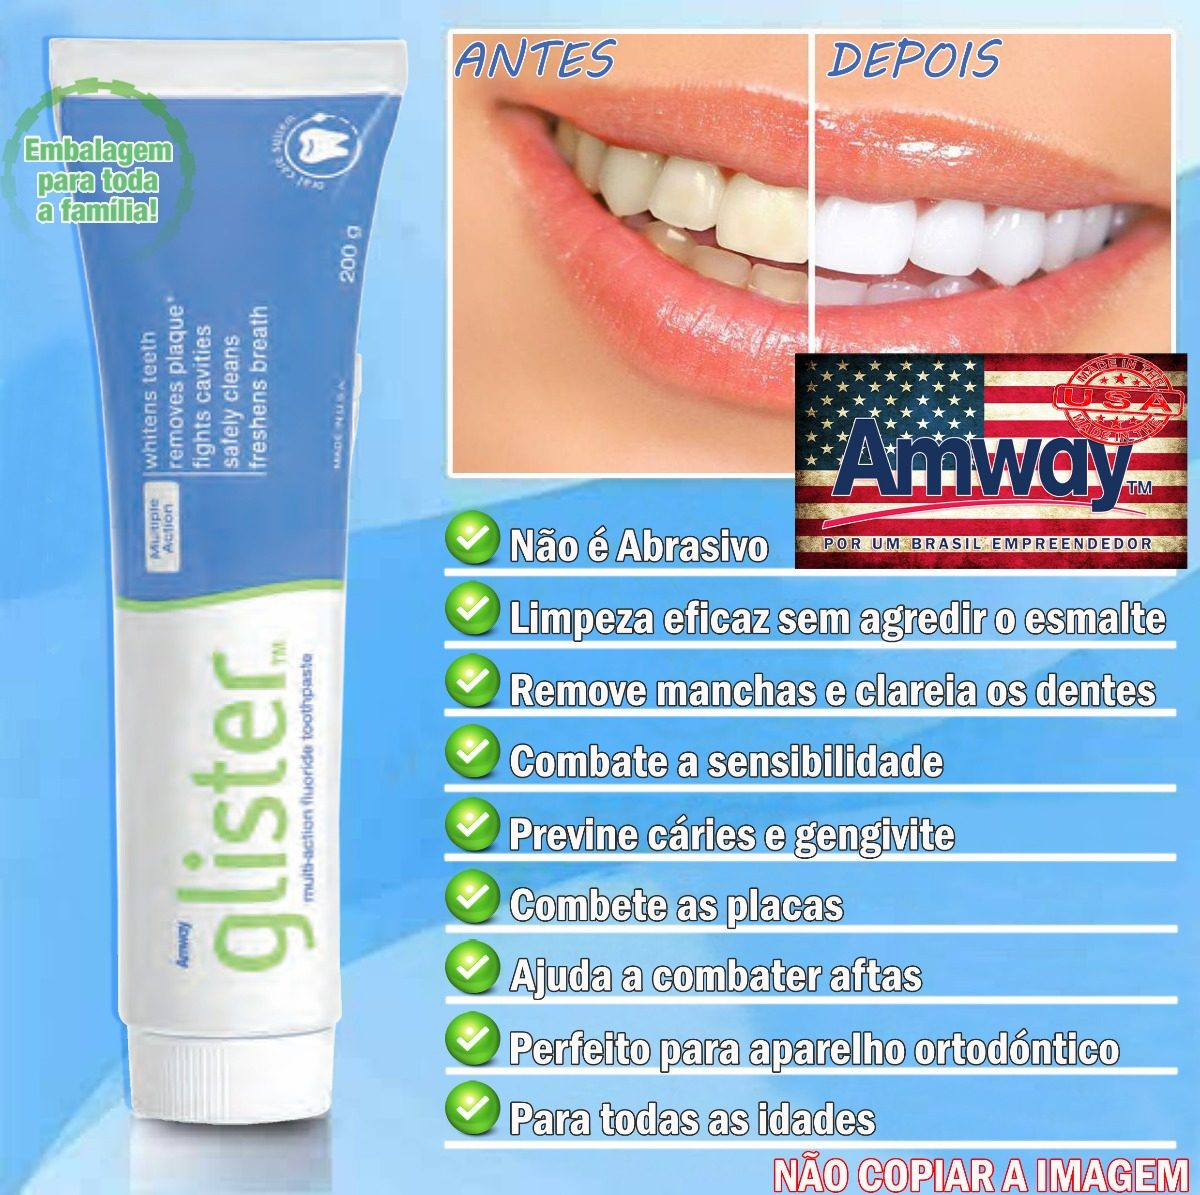 Glister Creme Dental 200g Pasta De Dente 5 Unidades Amway 05 R